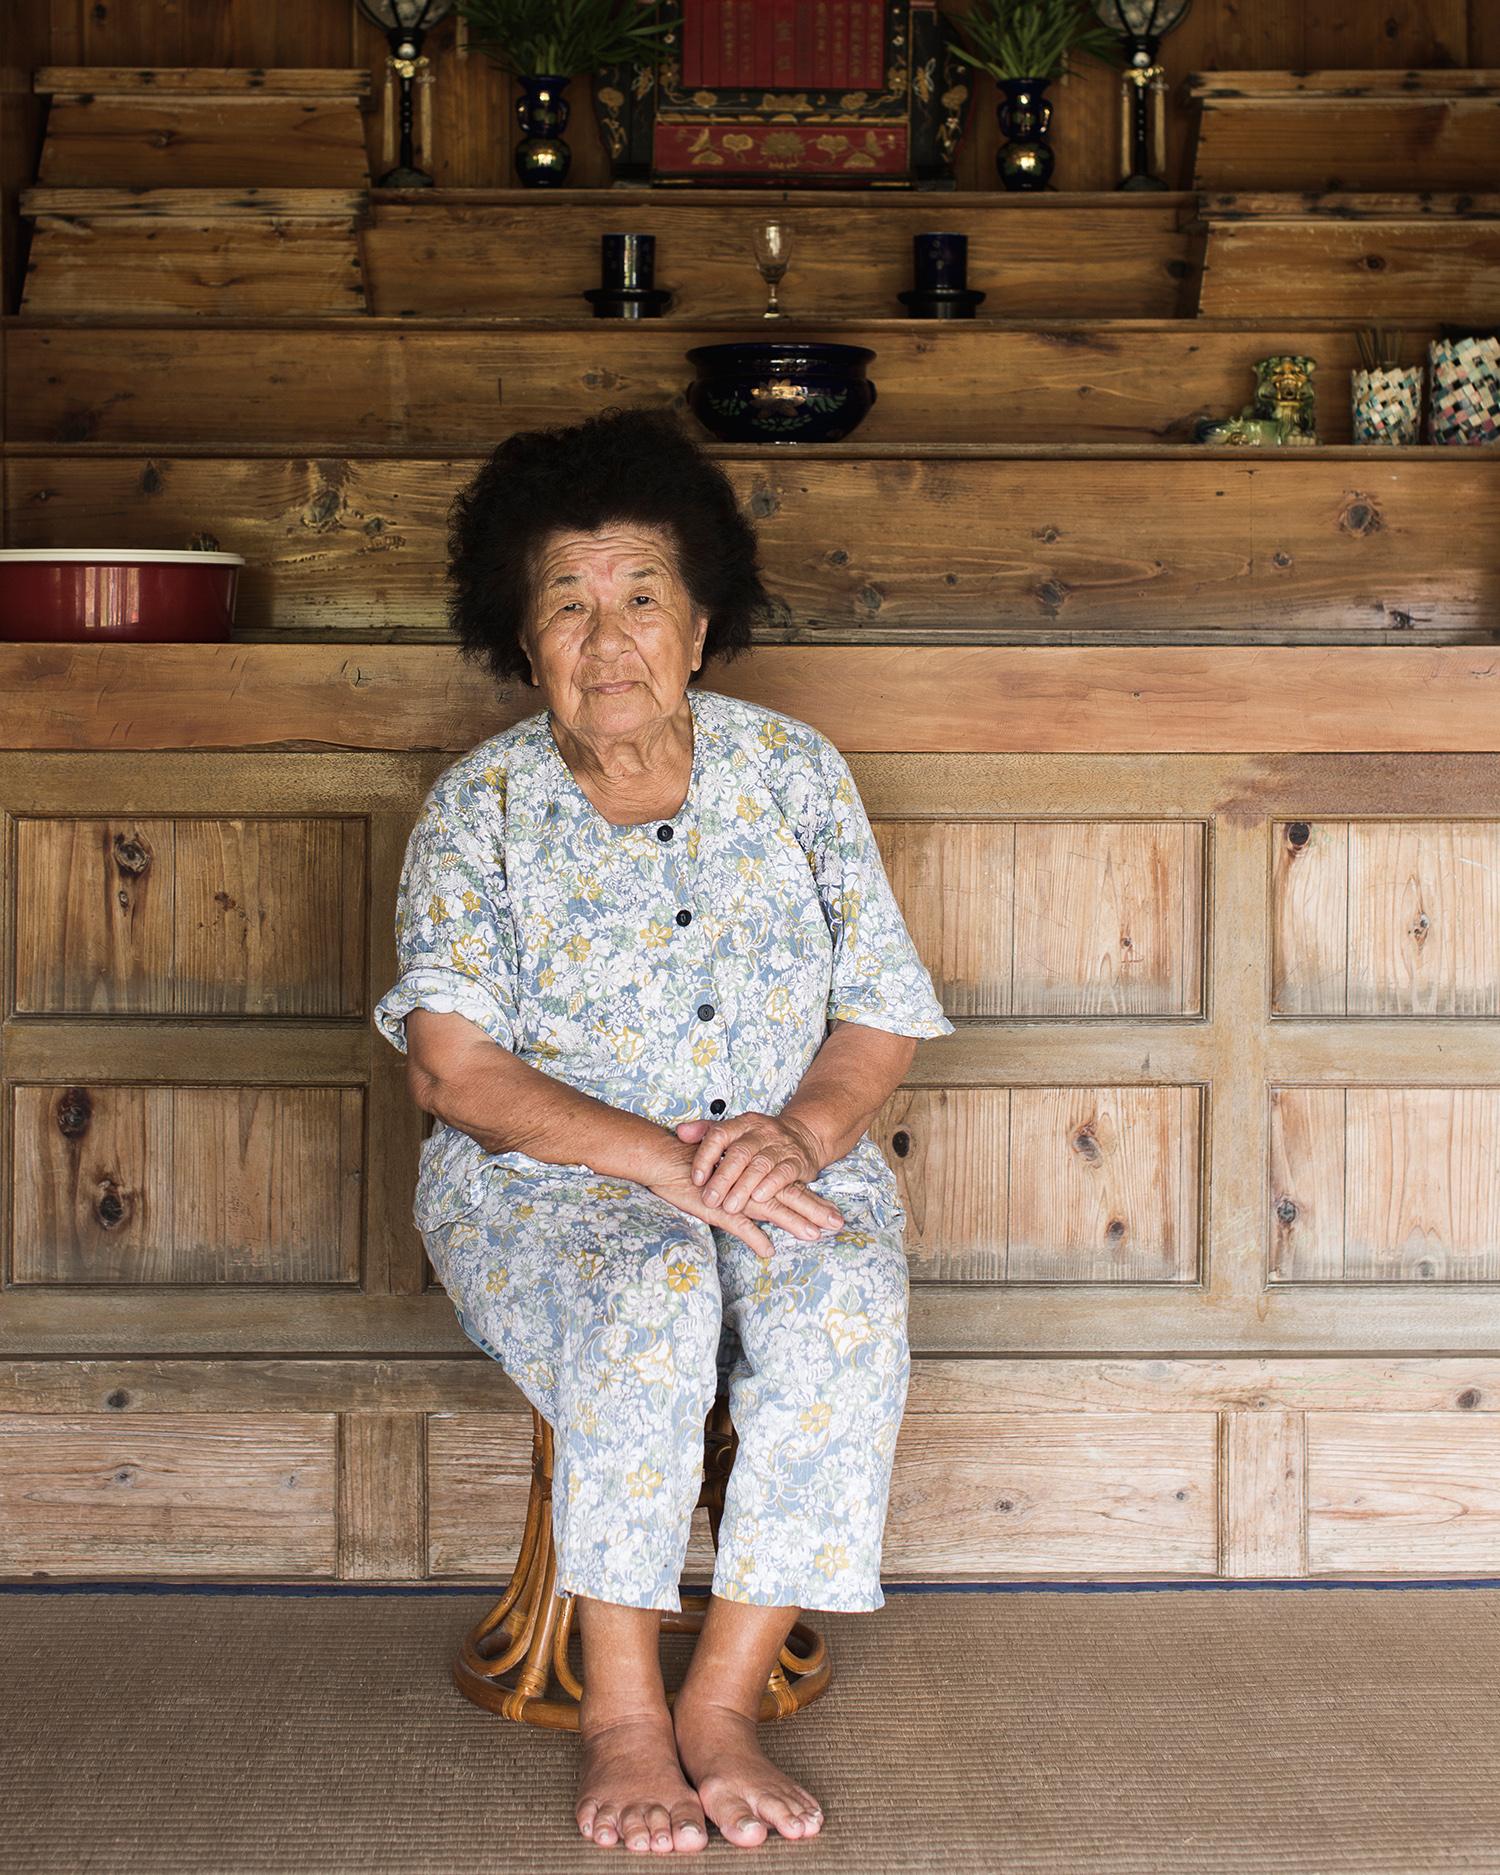 130801_Nakada_Hatsue_welcomes_anyone_into_her_home_for_tea_Izena_Island_1257.jpg